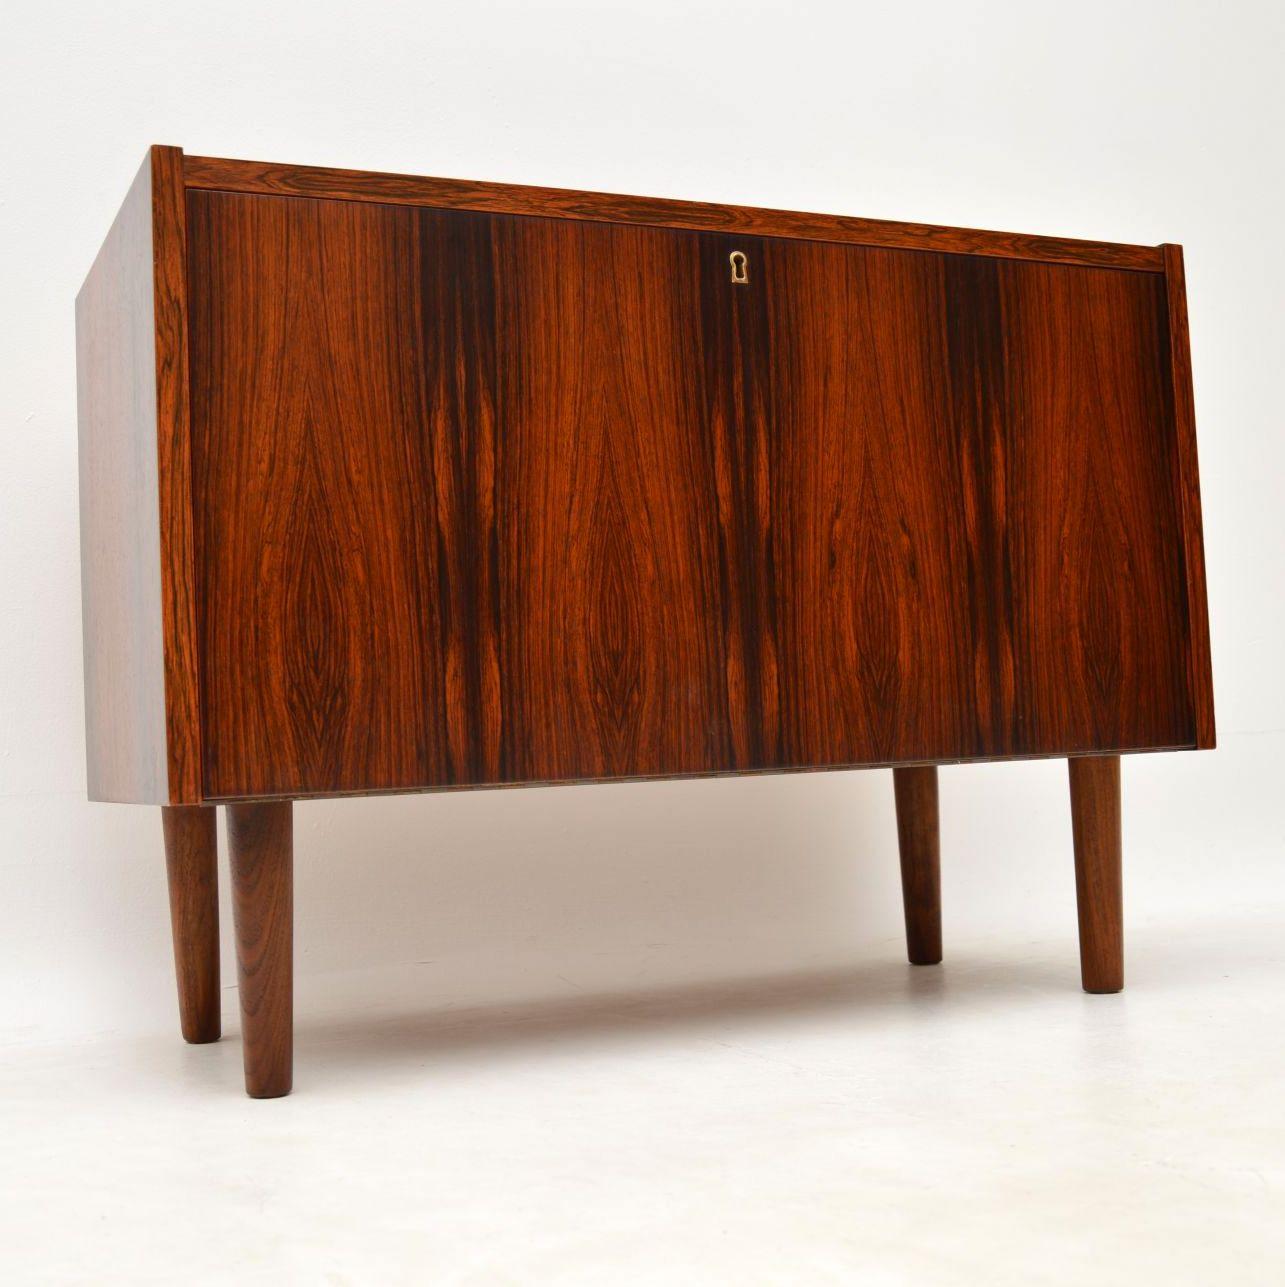 1960's Danish Vintage Rosewood Cabinet - 1960's Danish Vintage Rosewood Cabinet Retrospective Interiors